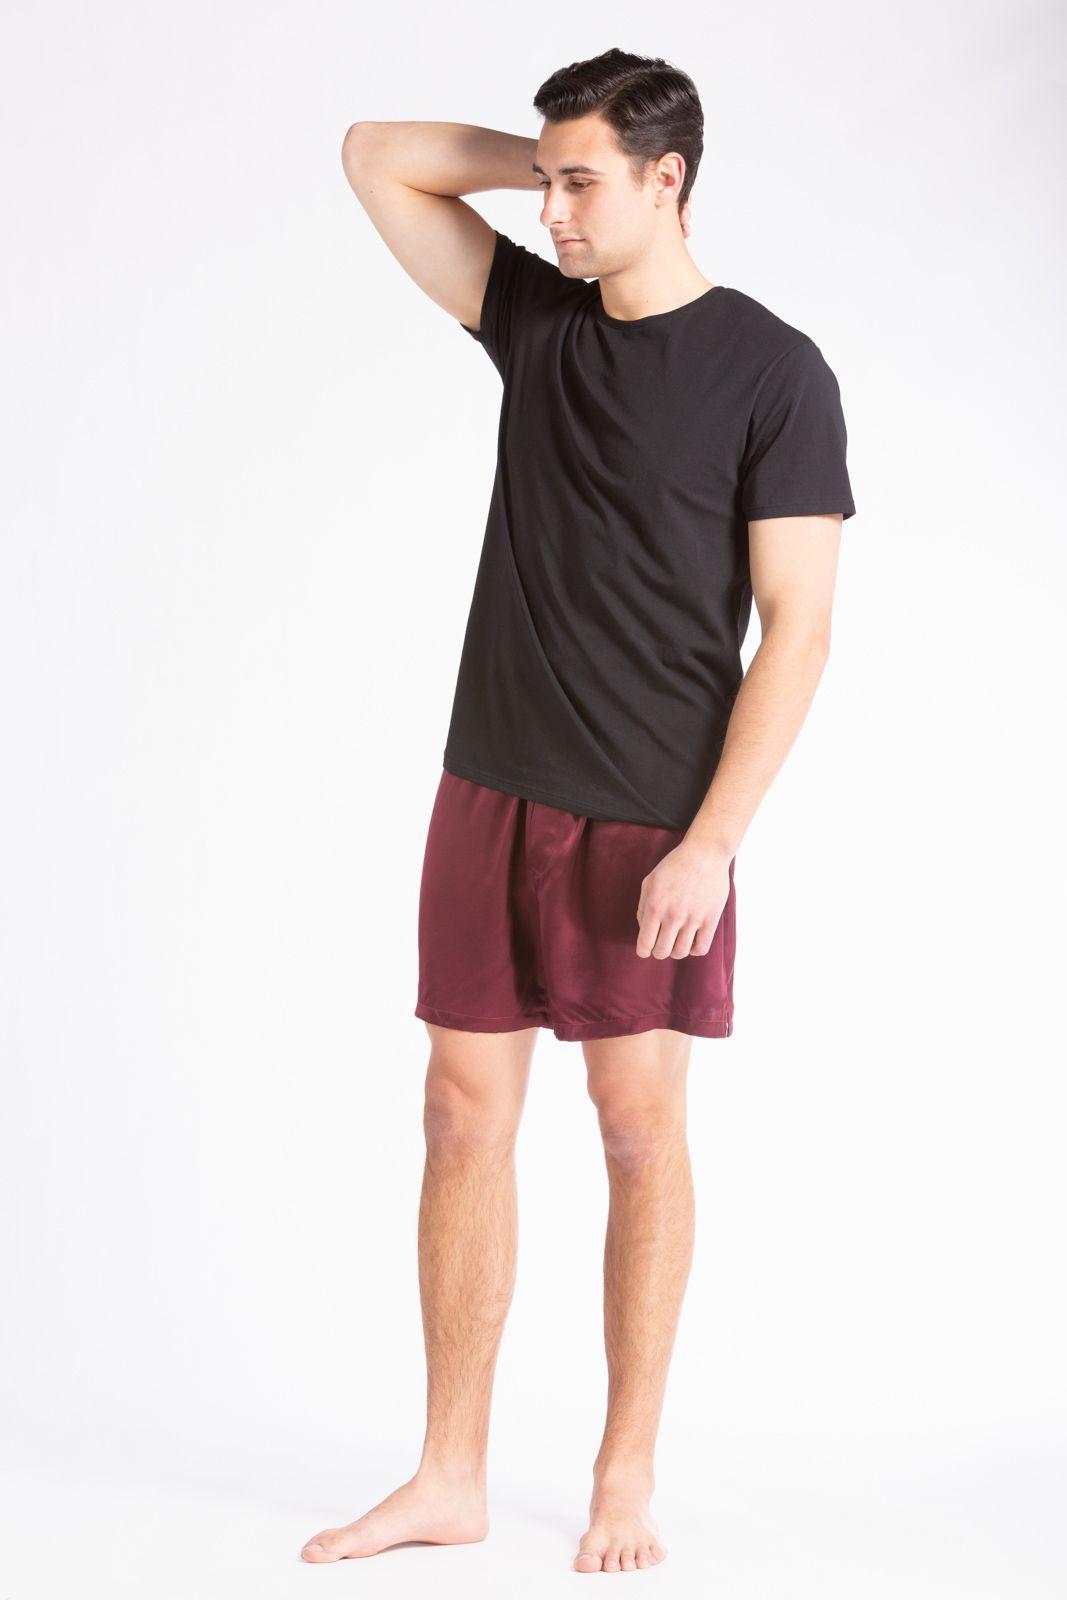 Mens Lounge boxer Shorts